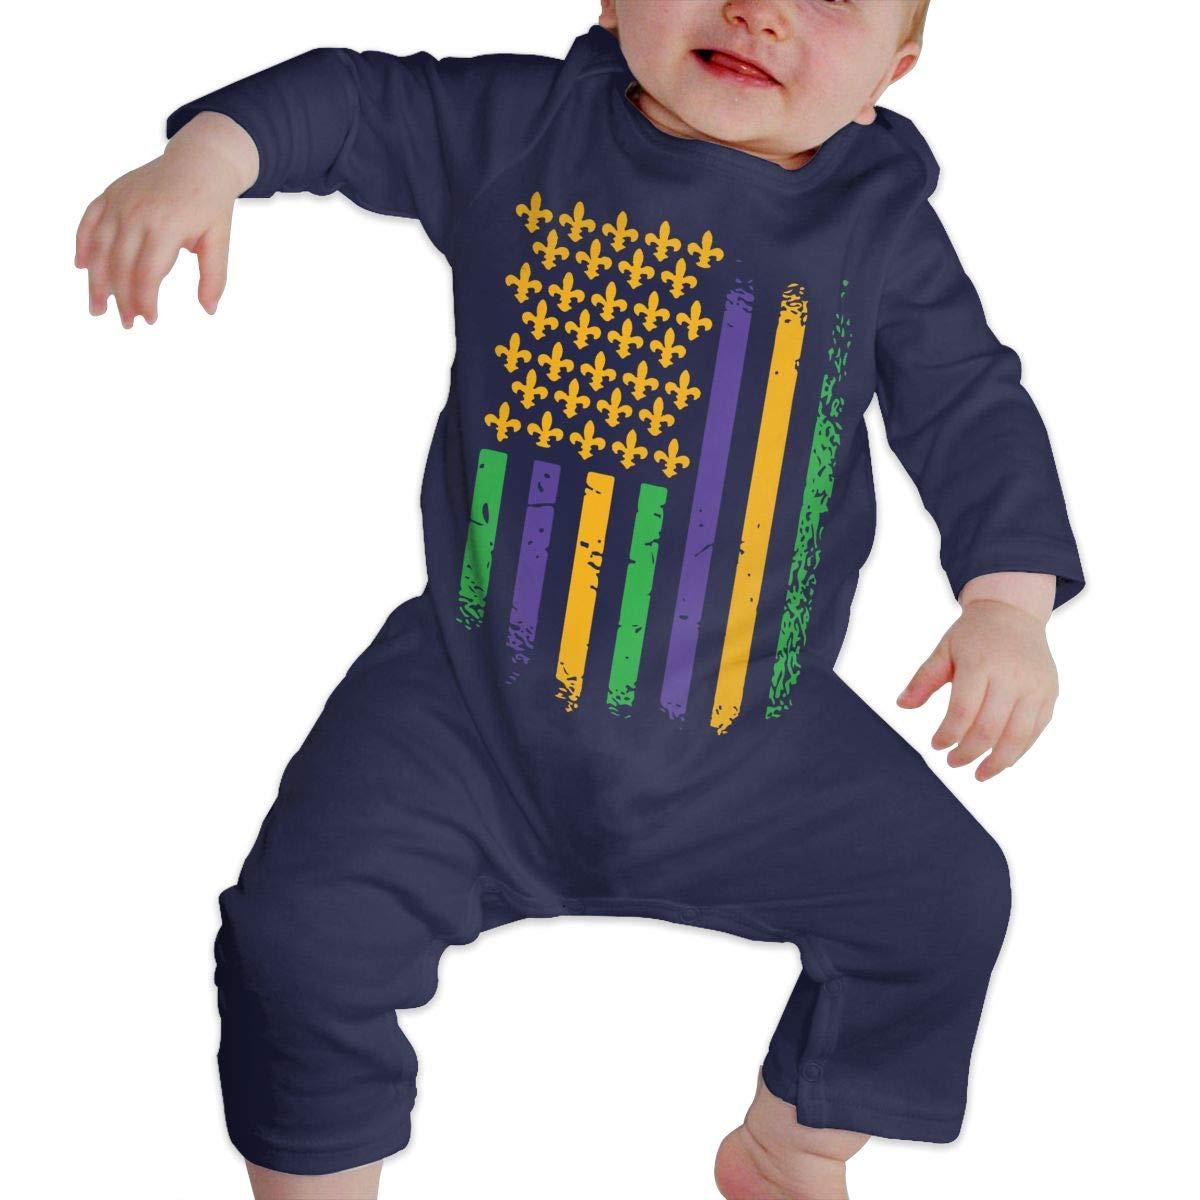 LBJQ8 US Mardi Gras Flag Infant Girls Boys Sleep and Play Bodysuit Jumpsuit Outfits